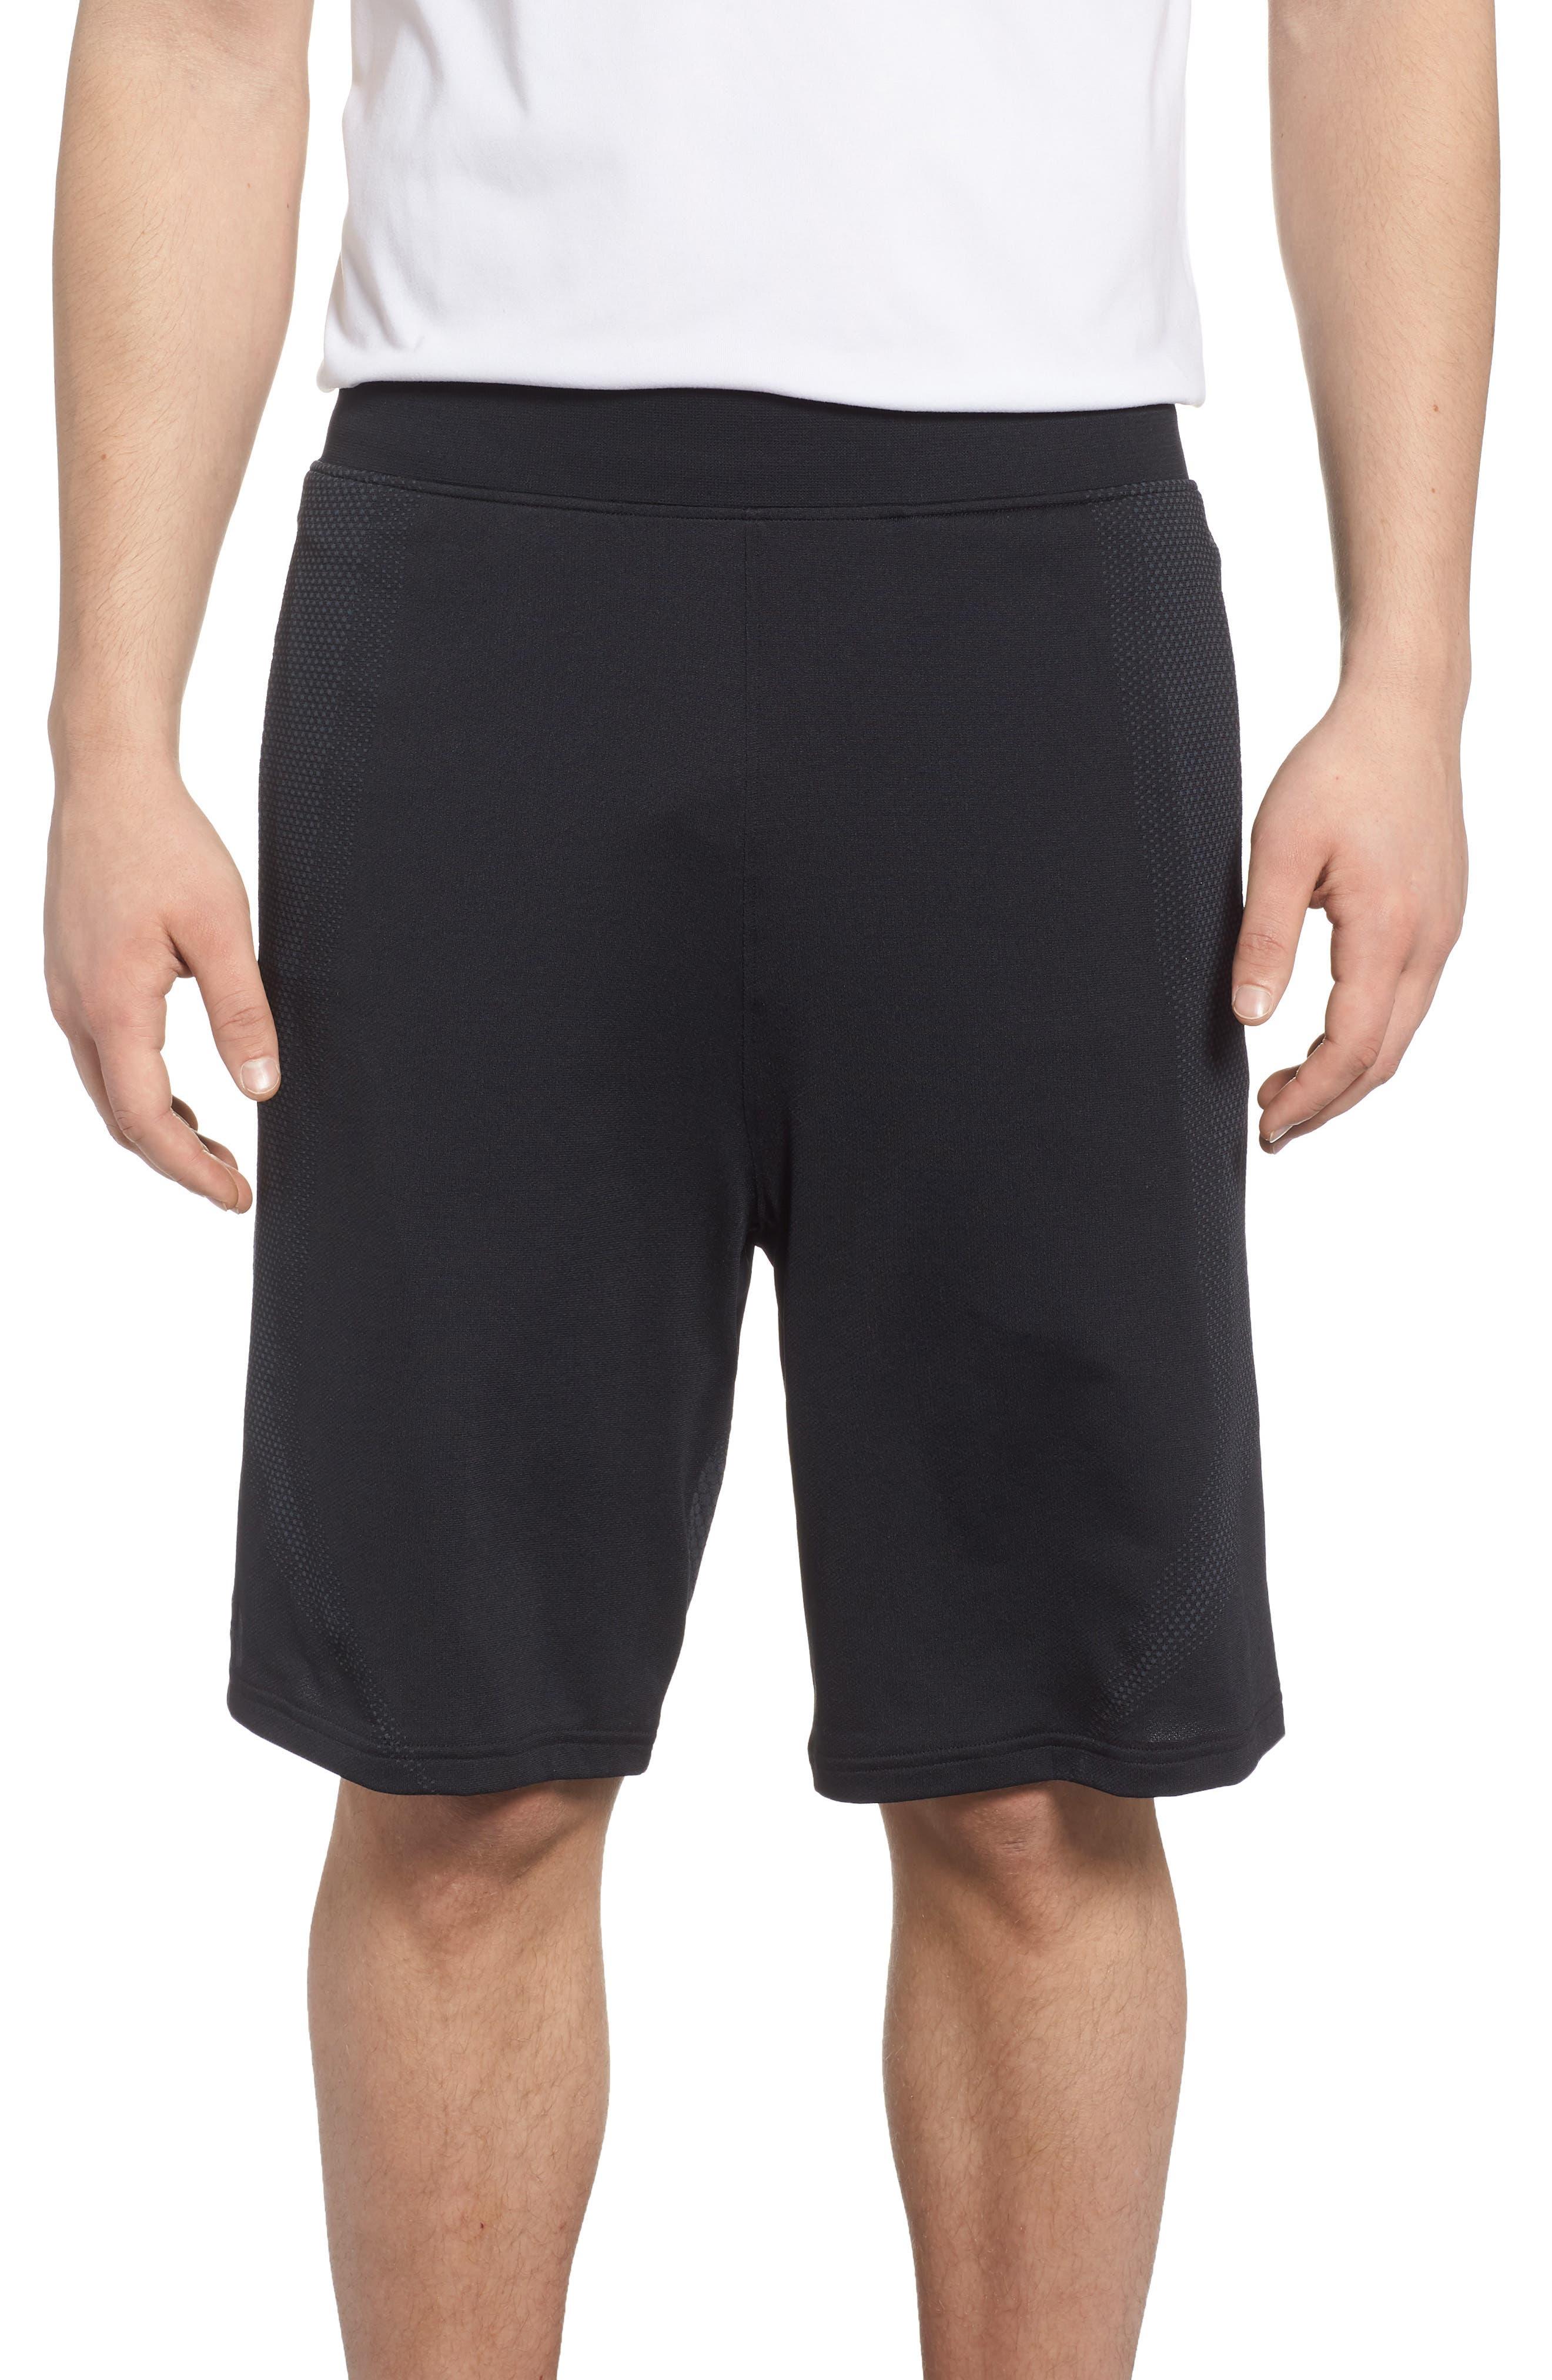 Threadborne Seamless Shorts,                         Main,                         color, BLACK/ STEALTH GREH